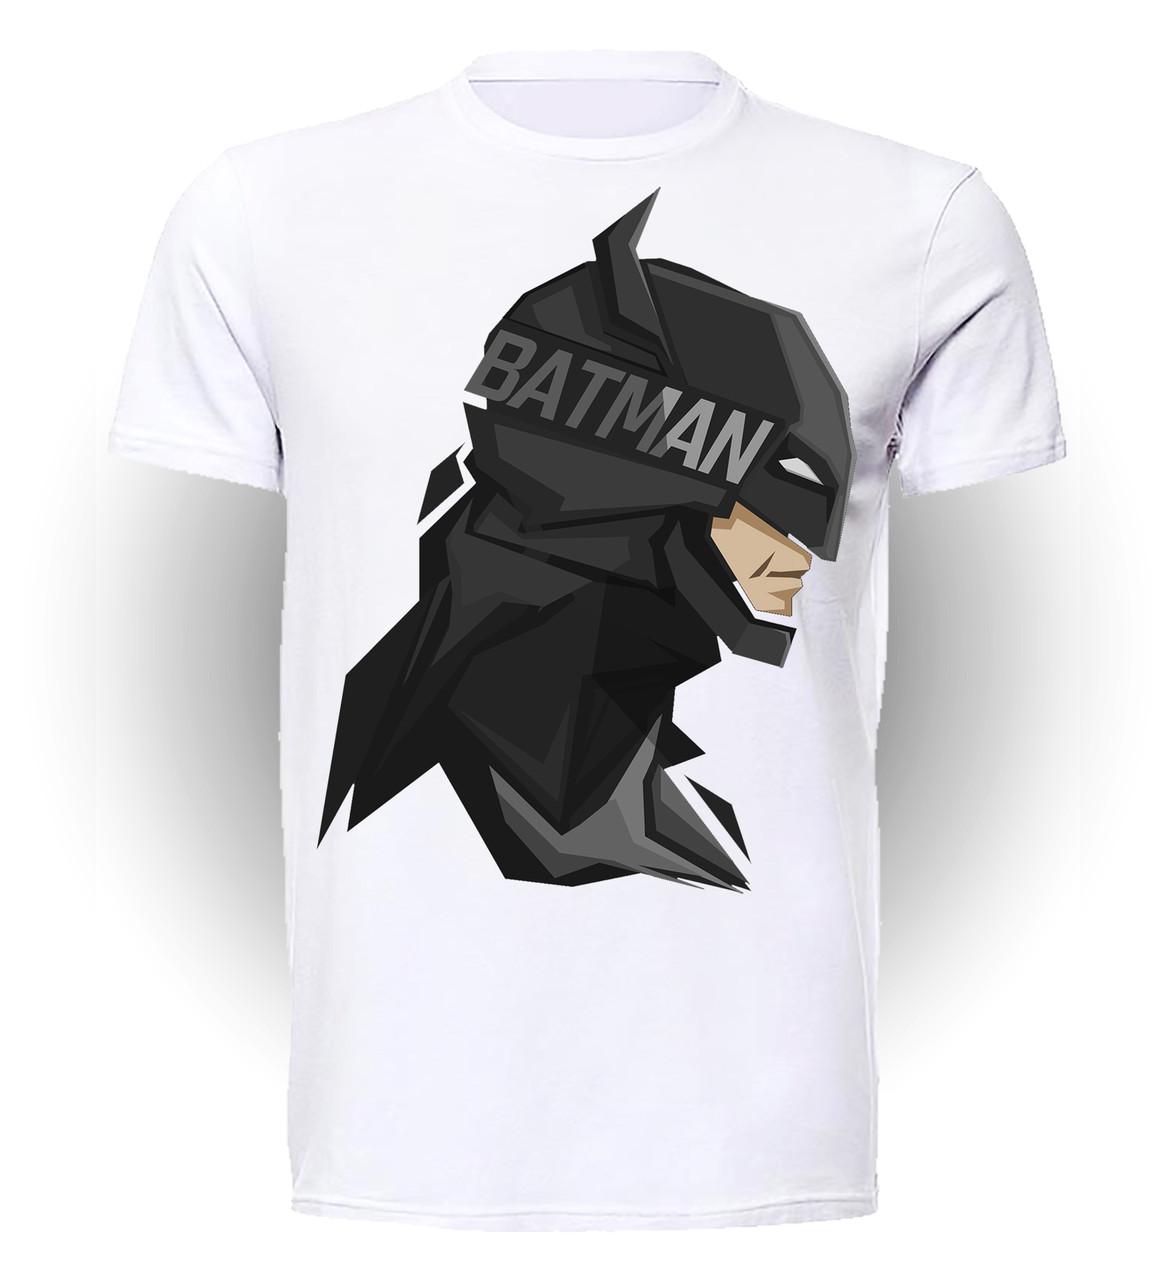 Футболка GeekLand Бэтмен Batman geometric BM.01.041